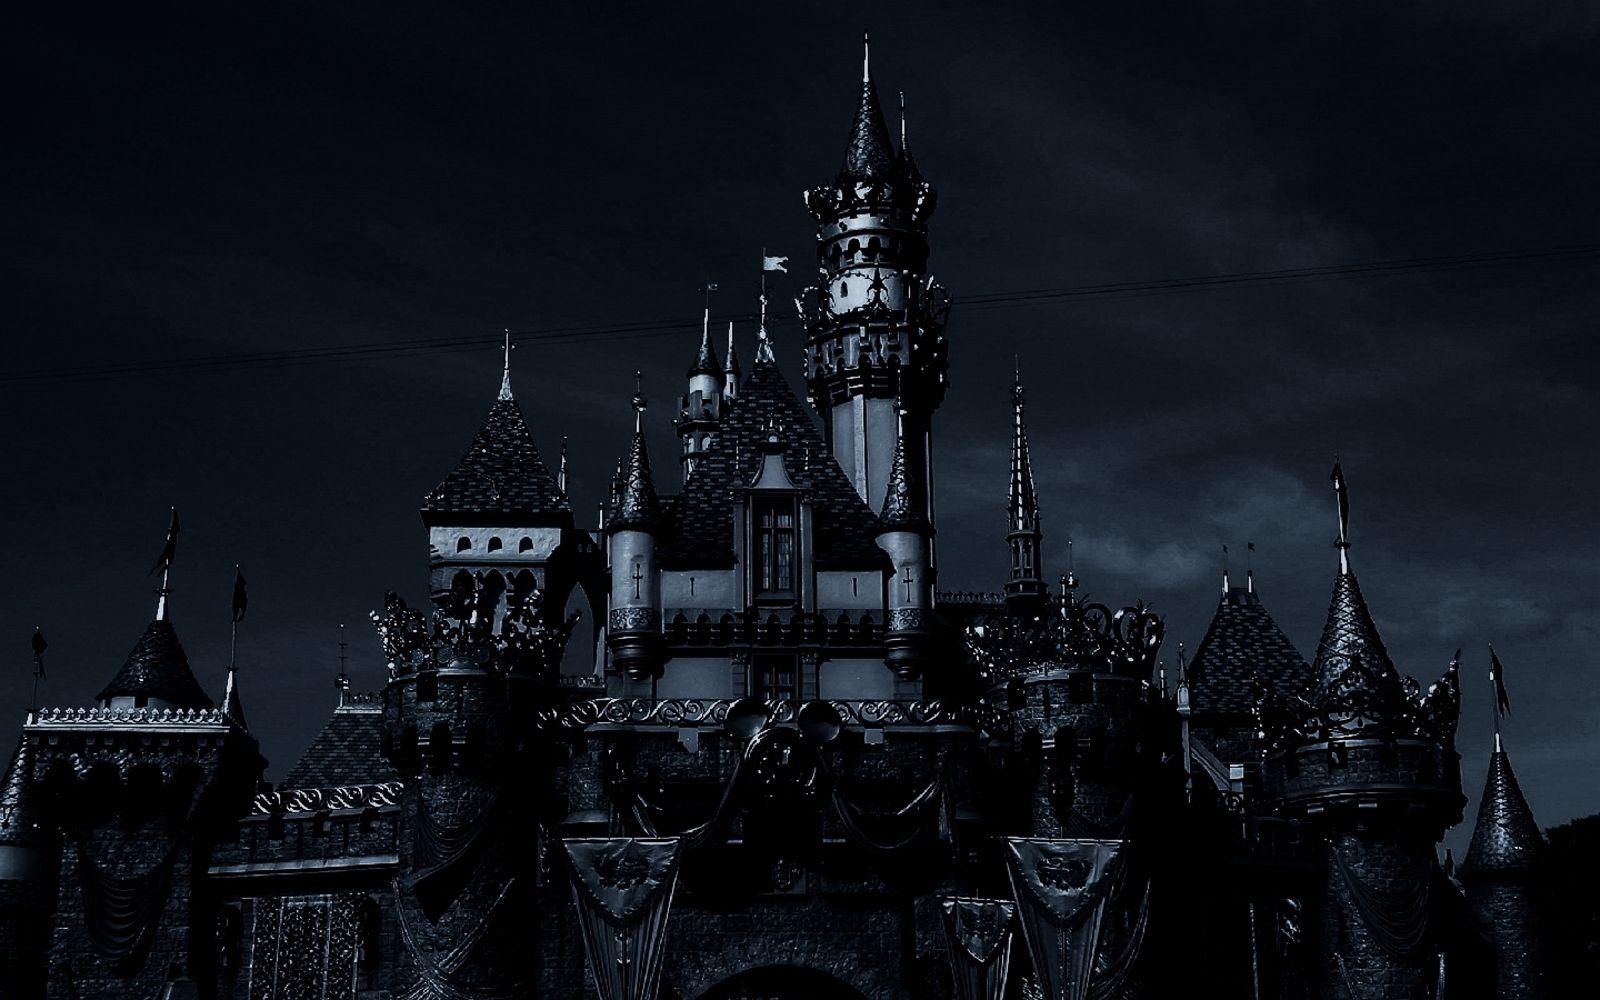 Pin By Mark On Crusnik Vampires Dark Castle Gothic Pictures Fantasy Castle